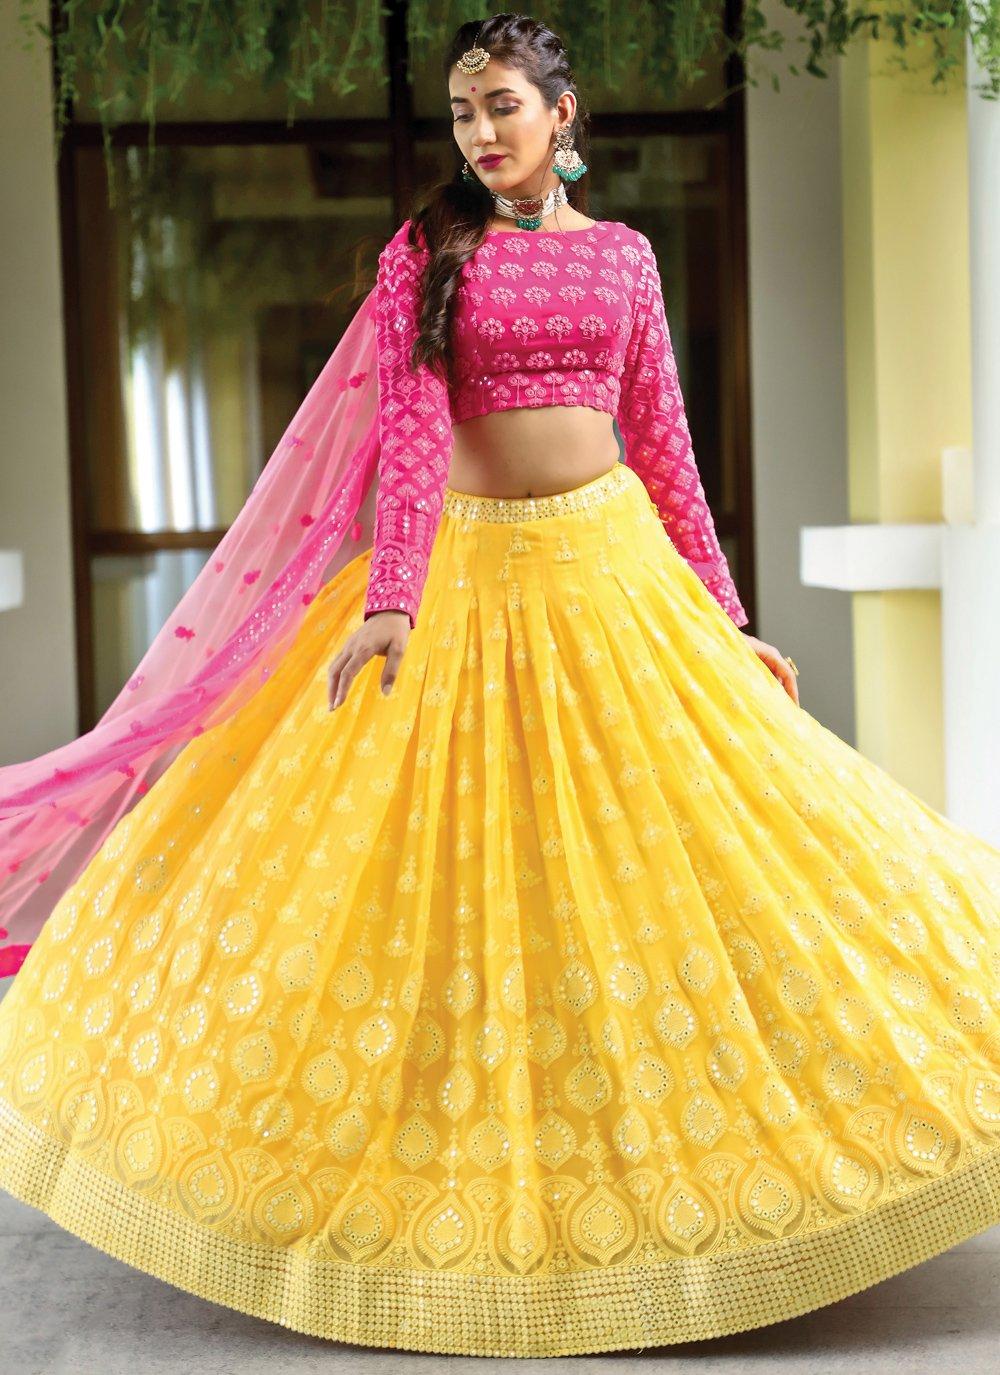 Pink and Yellow Wedding Bamber Georgette  Readymade Lehenga Choli